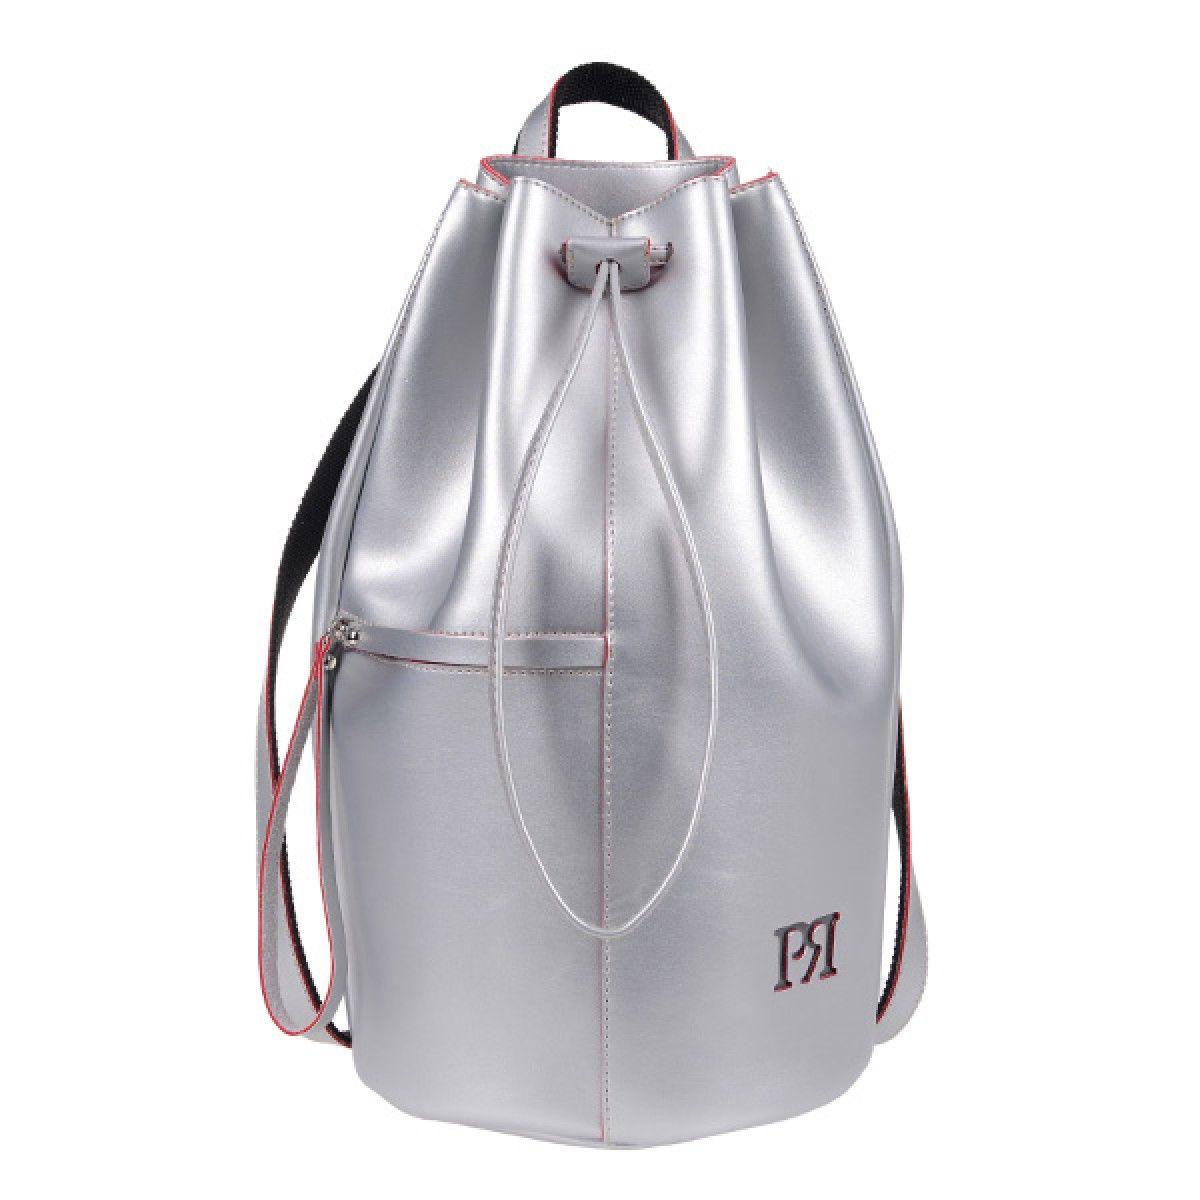 3b3a6acff4 ΤΣΑΝΤΑ PIERRO 00175 ΑΣΗΜΙ Σακίδιο πλάτης τύπου πουγκί με εξωτερικό τσεπάκι  με φερμουάρ. Ύψος 40